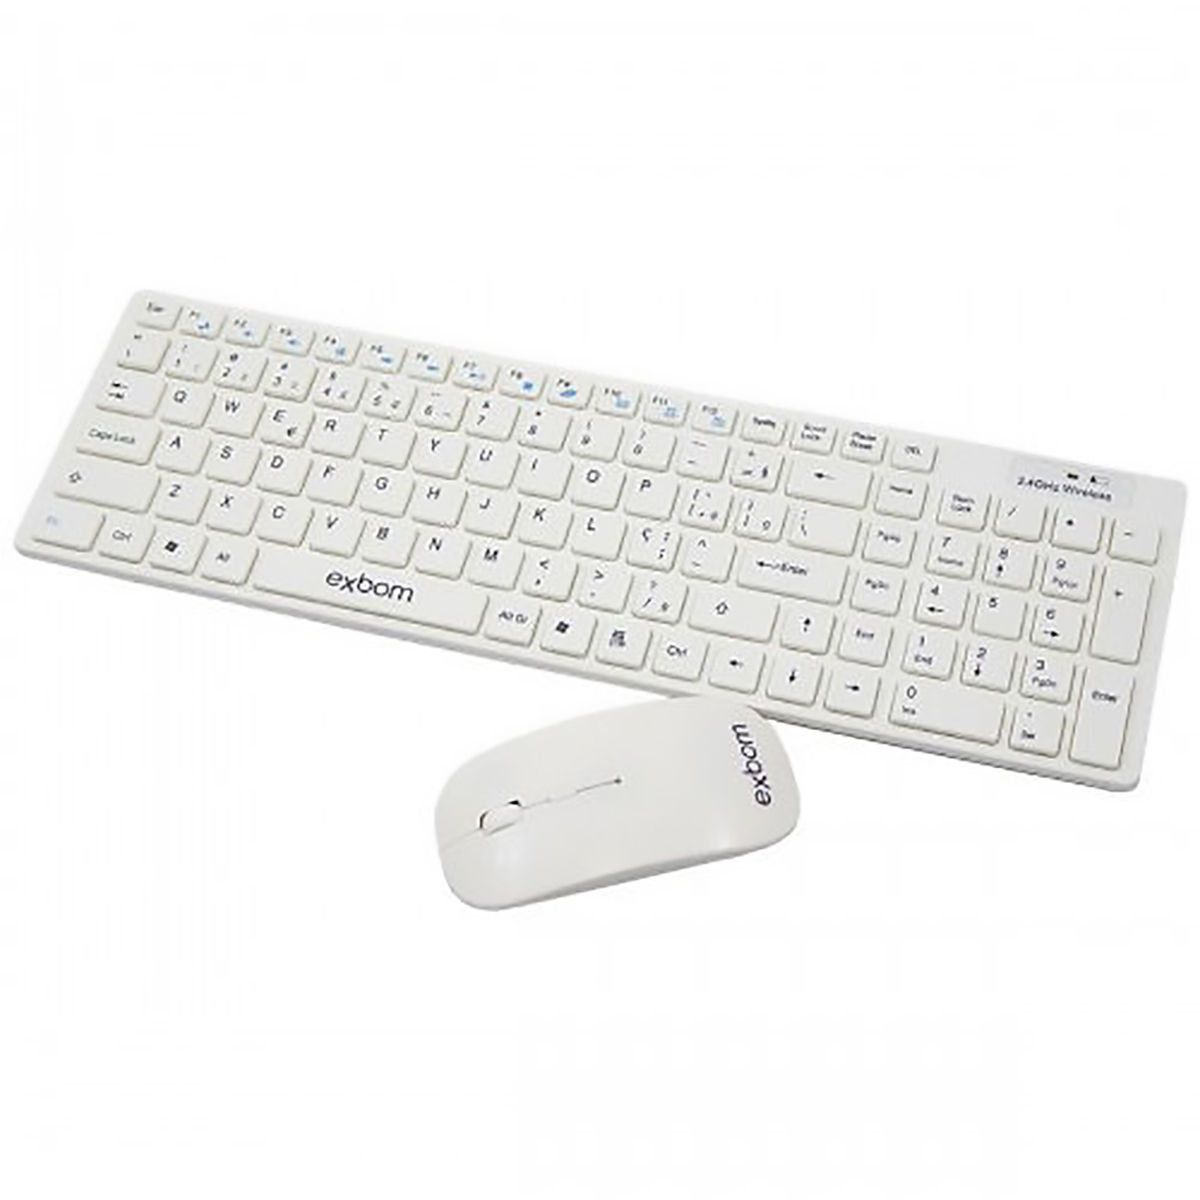 Kit Teclado + Mouse Wireless Sem Fio 2.4Ghz 1600 Dpi Exbom BK-S1000 Branco